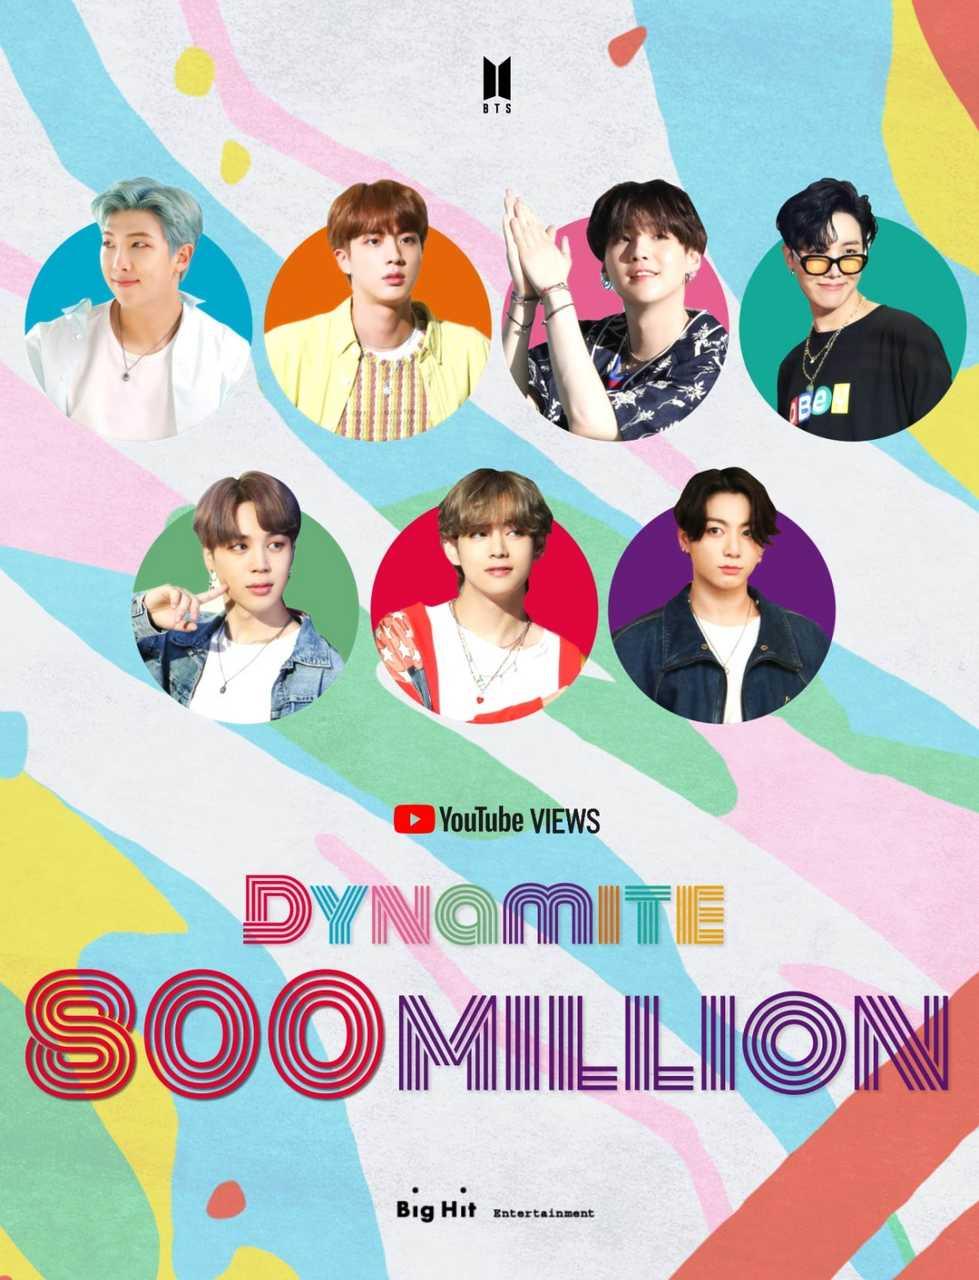 BTS「Dynamite」MV、8億ビュー突破!通算6回目の8億ビューMV!!